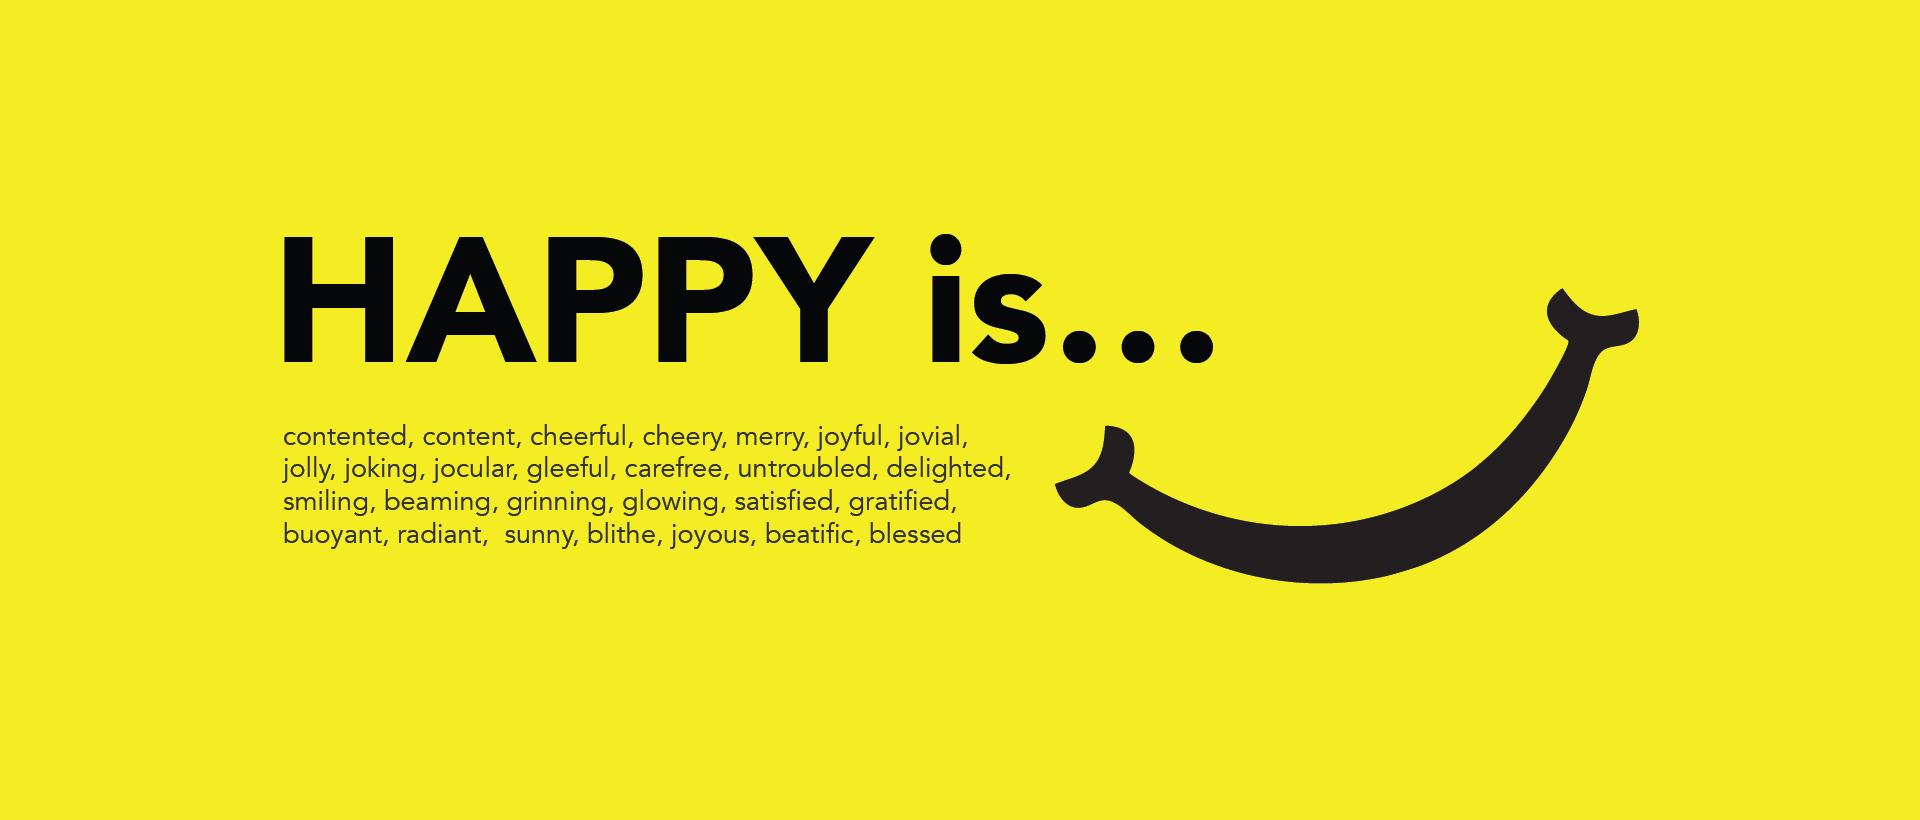 Happy Shappy - TAN-TA-DAN DESIGN